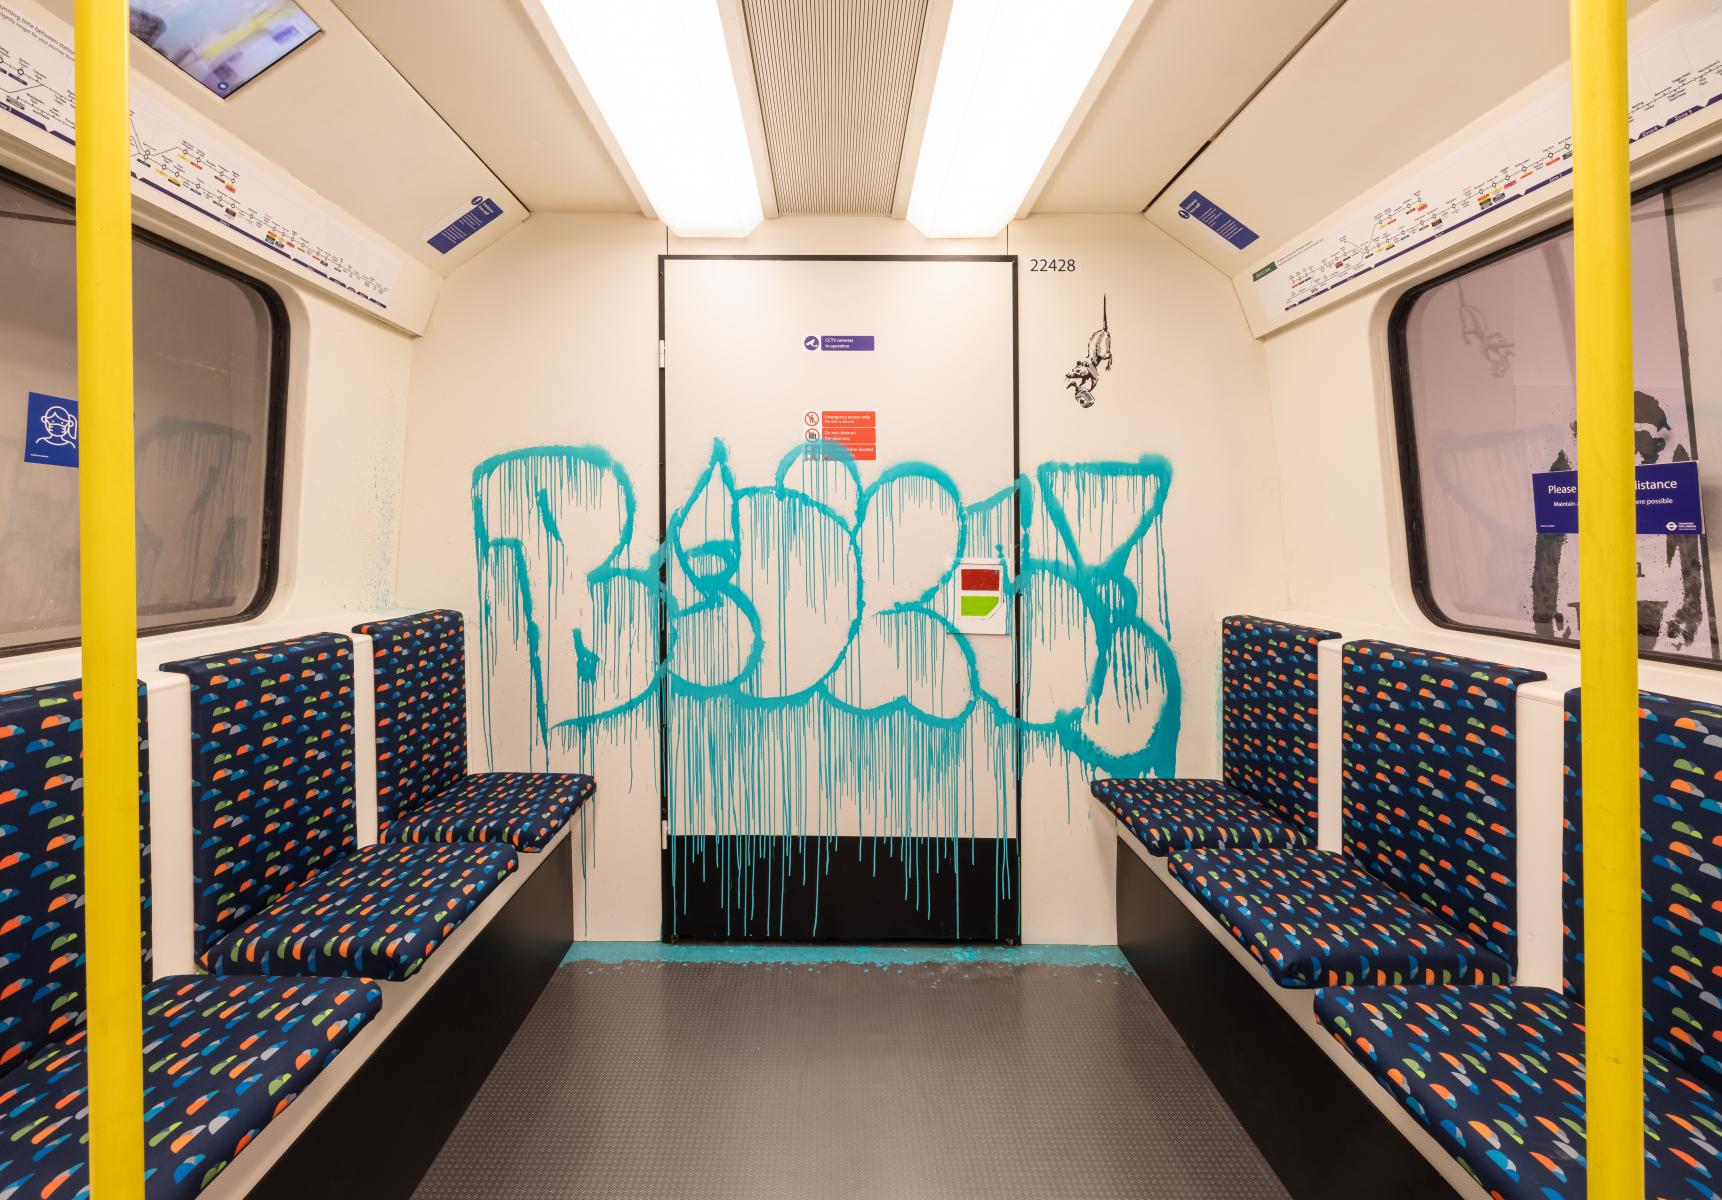 Mystery_of_Banksy_MUC_03_cDominik-Gruss.jpg